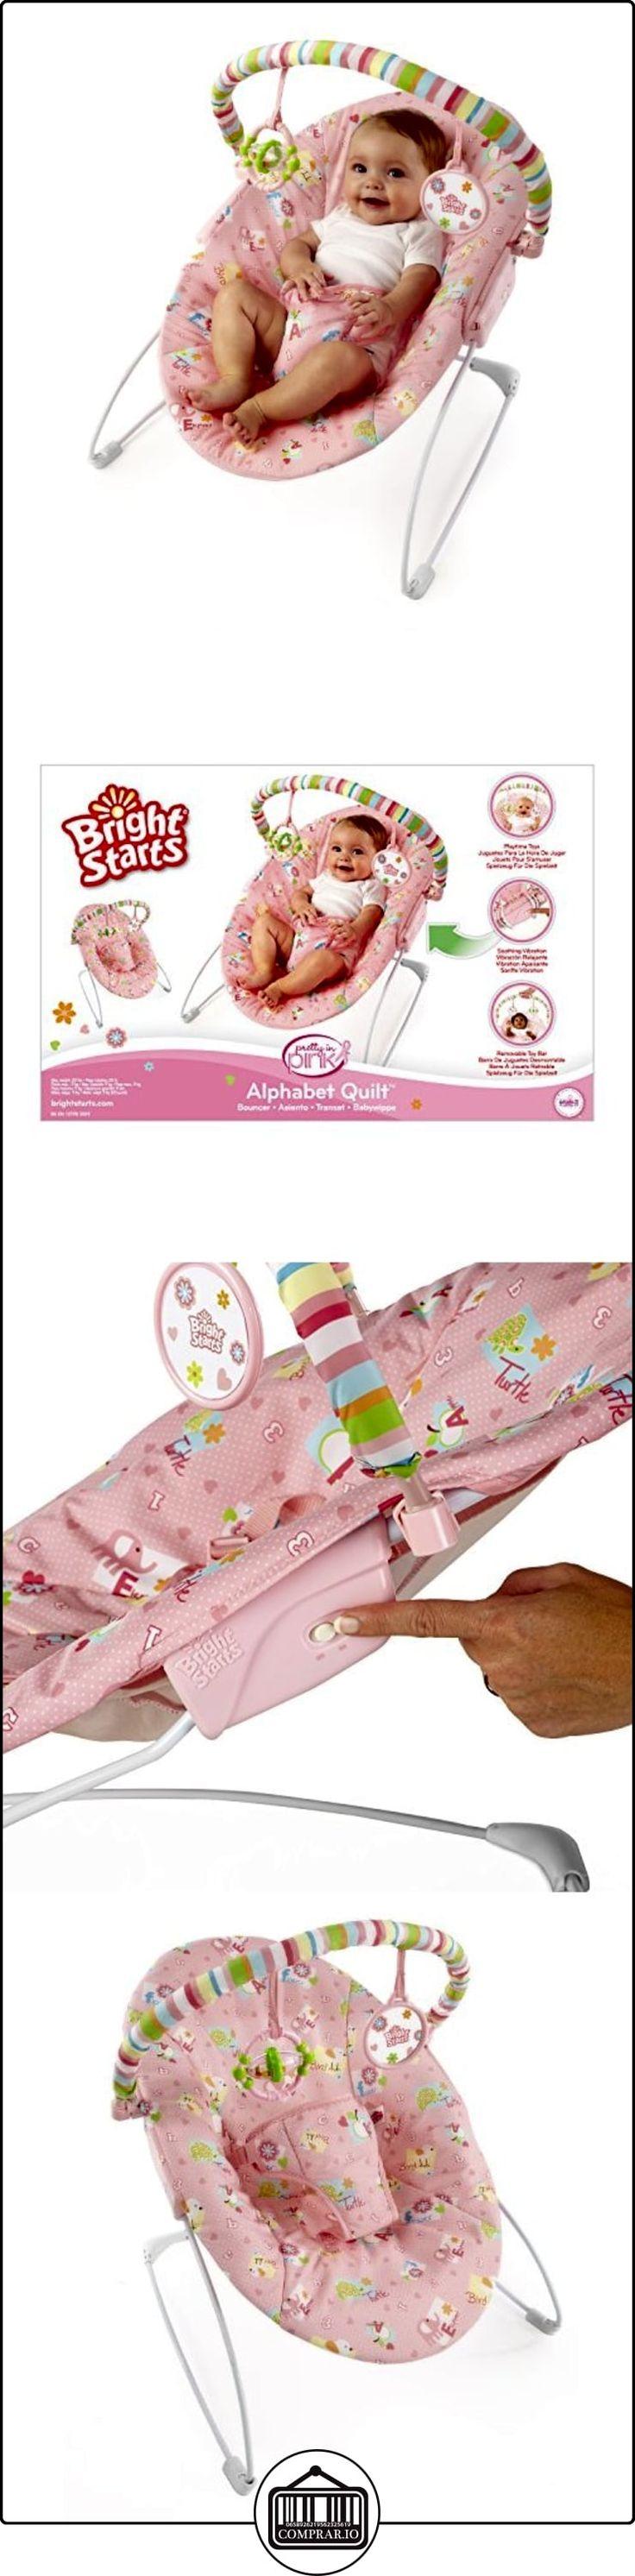 Bright-Starts - Hamaca de bebé Bright Starts Alphabet Quilt rosa  ✿ Regalos para recién nacidos - Bebes ✿ ▬► Ver oferta: http://comprar.io/goto/B007ZOKAKE